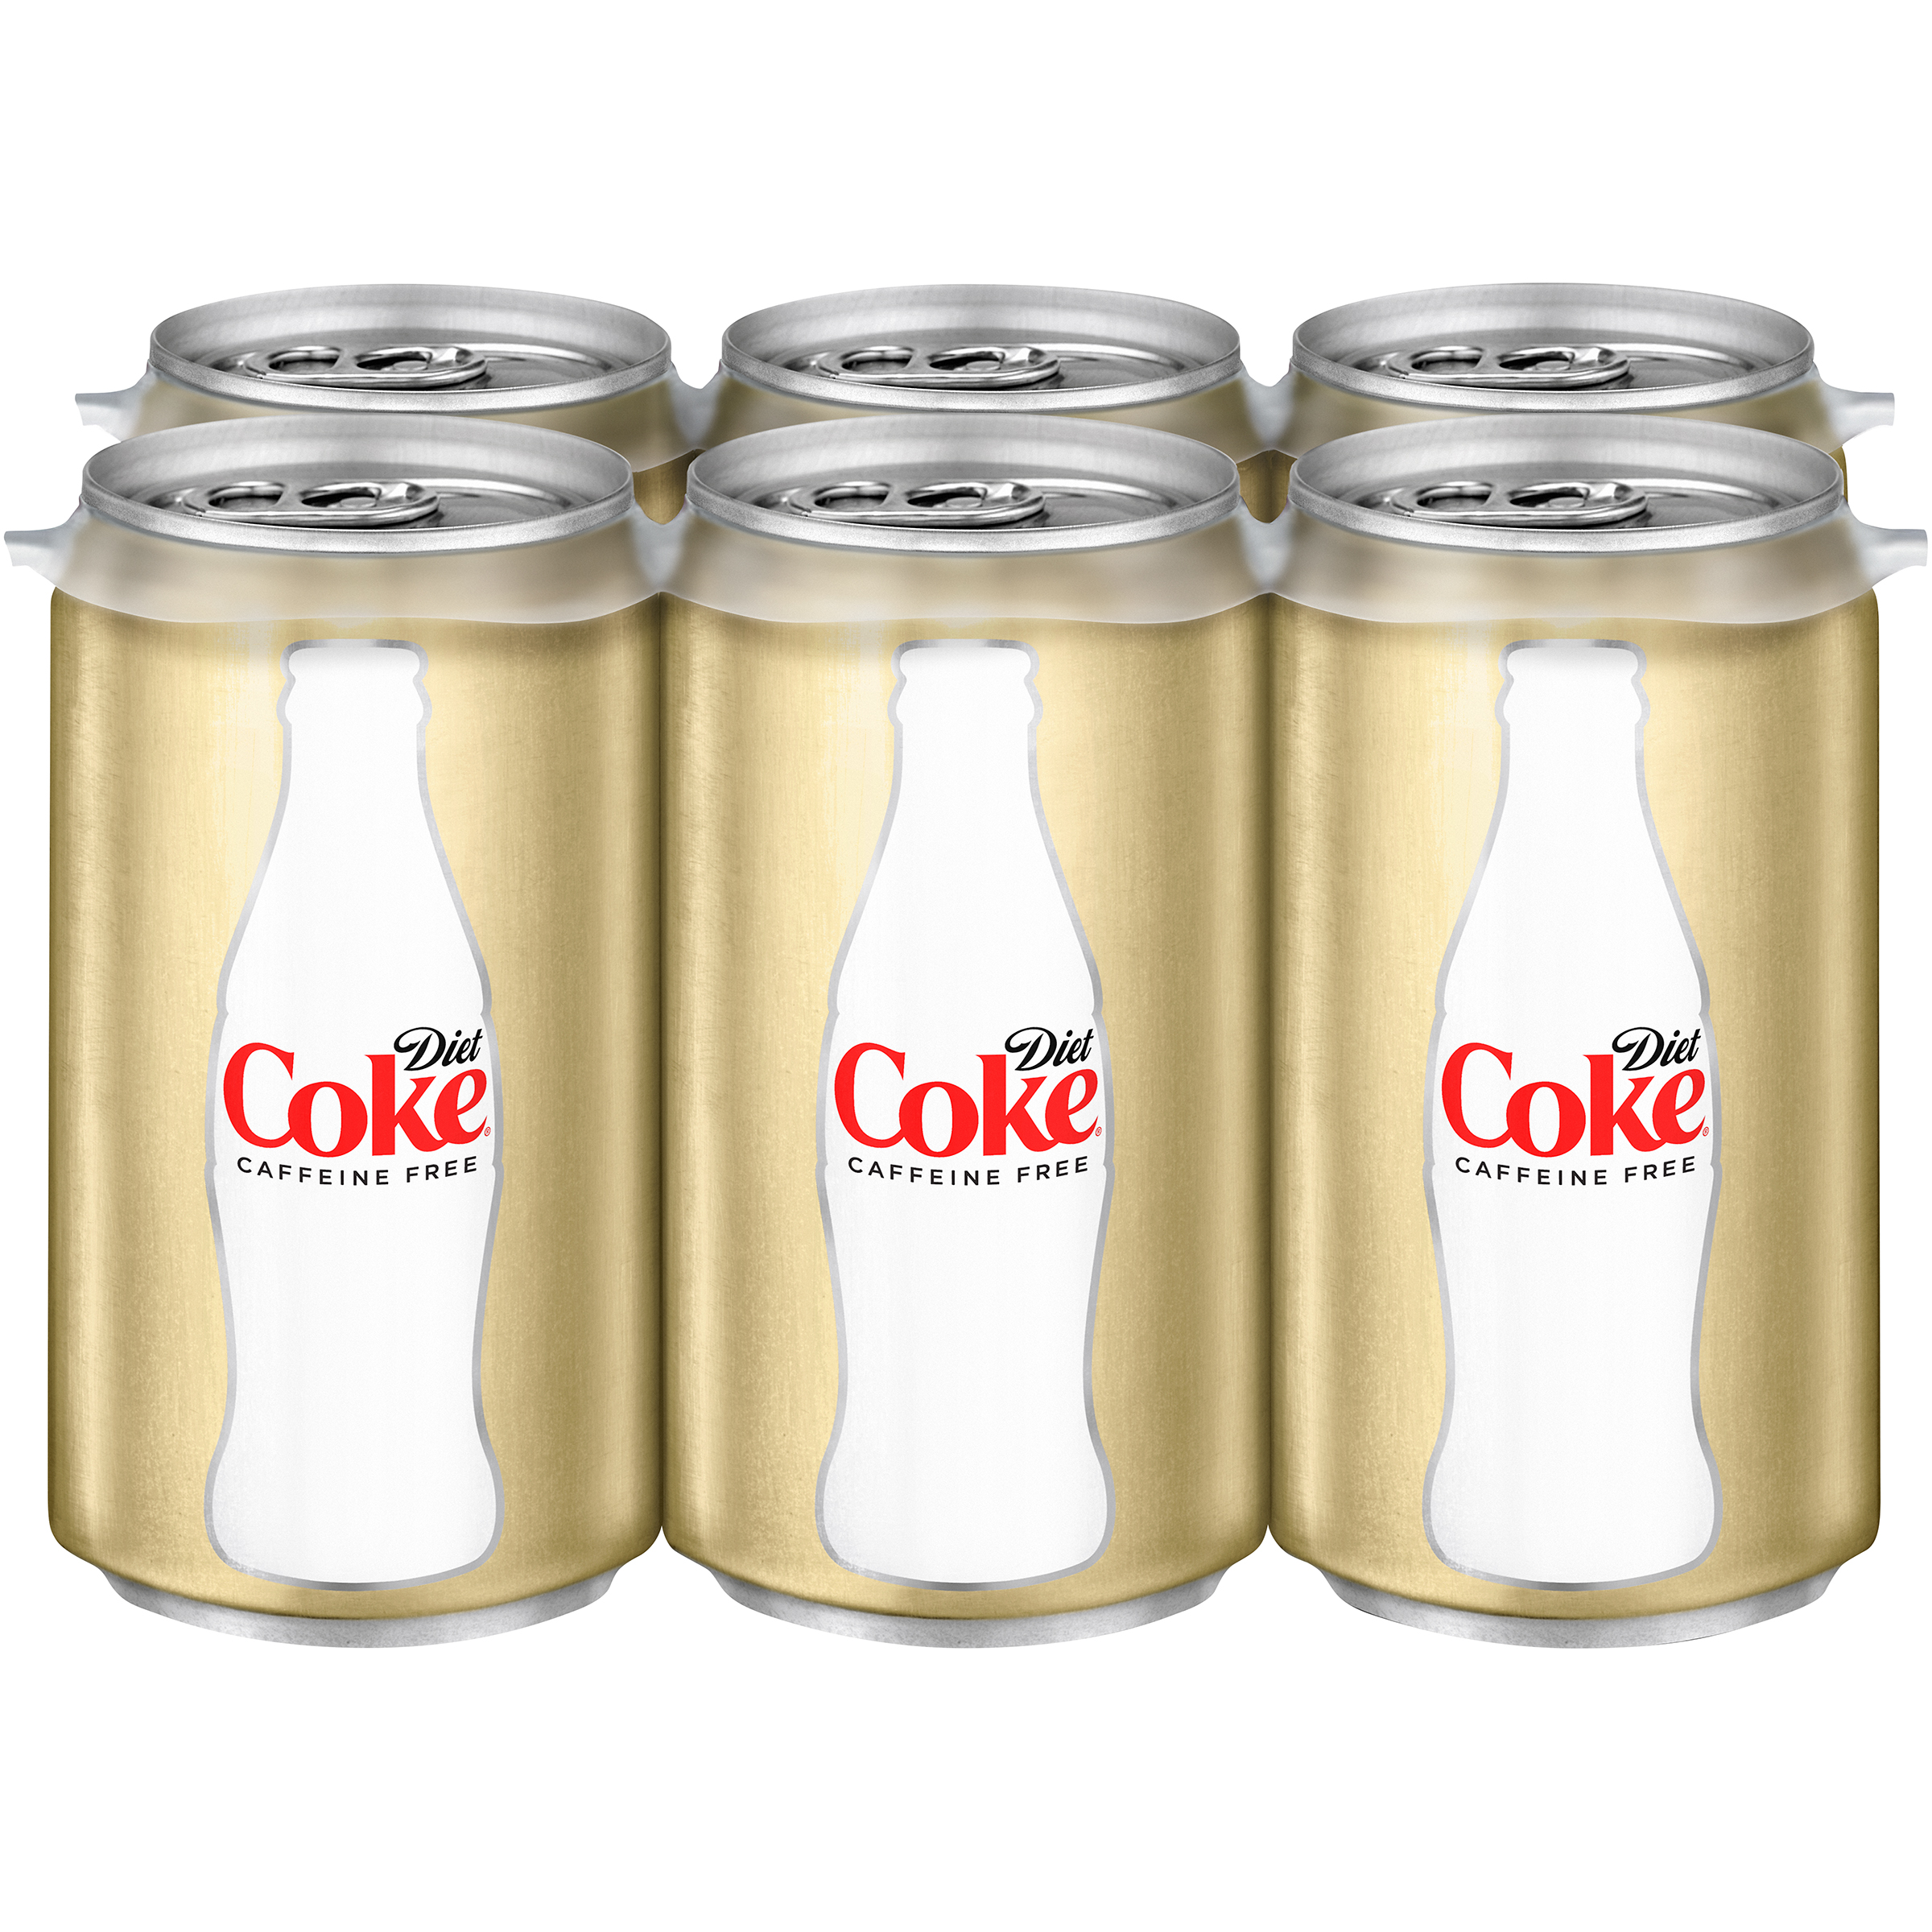 Diet Coke Caffeine-Free Soda, 7.5 Fl. Oz., 6 Count